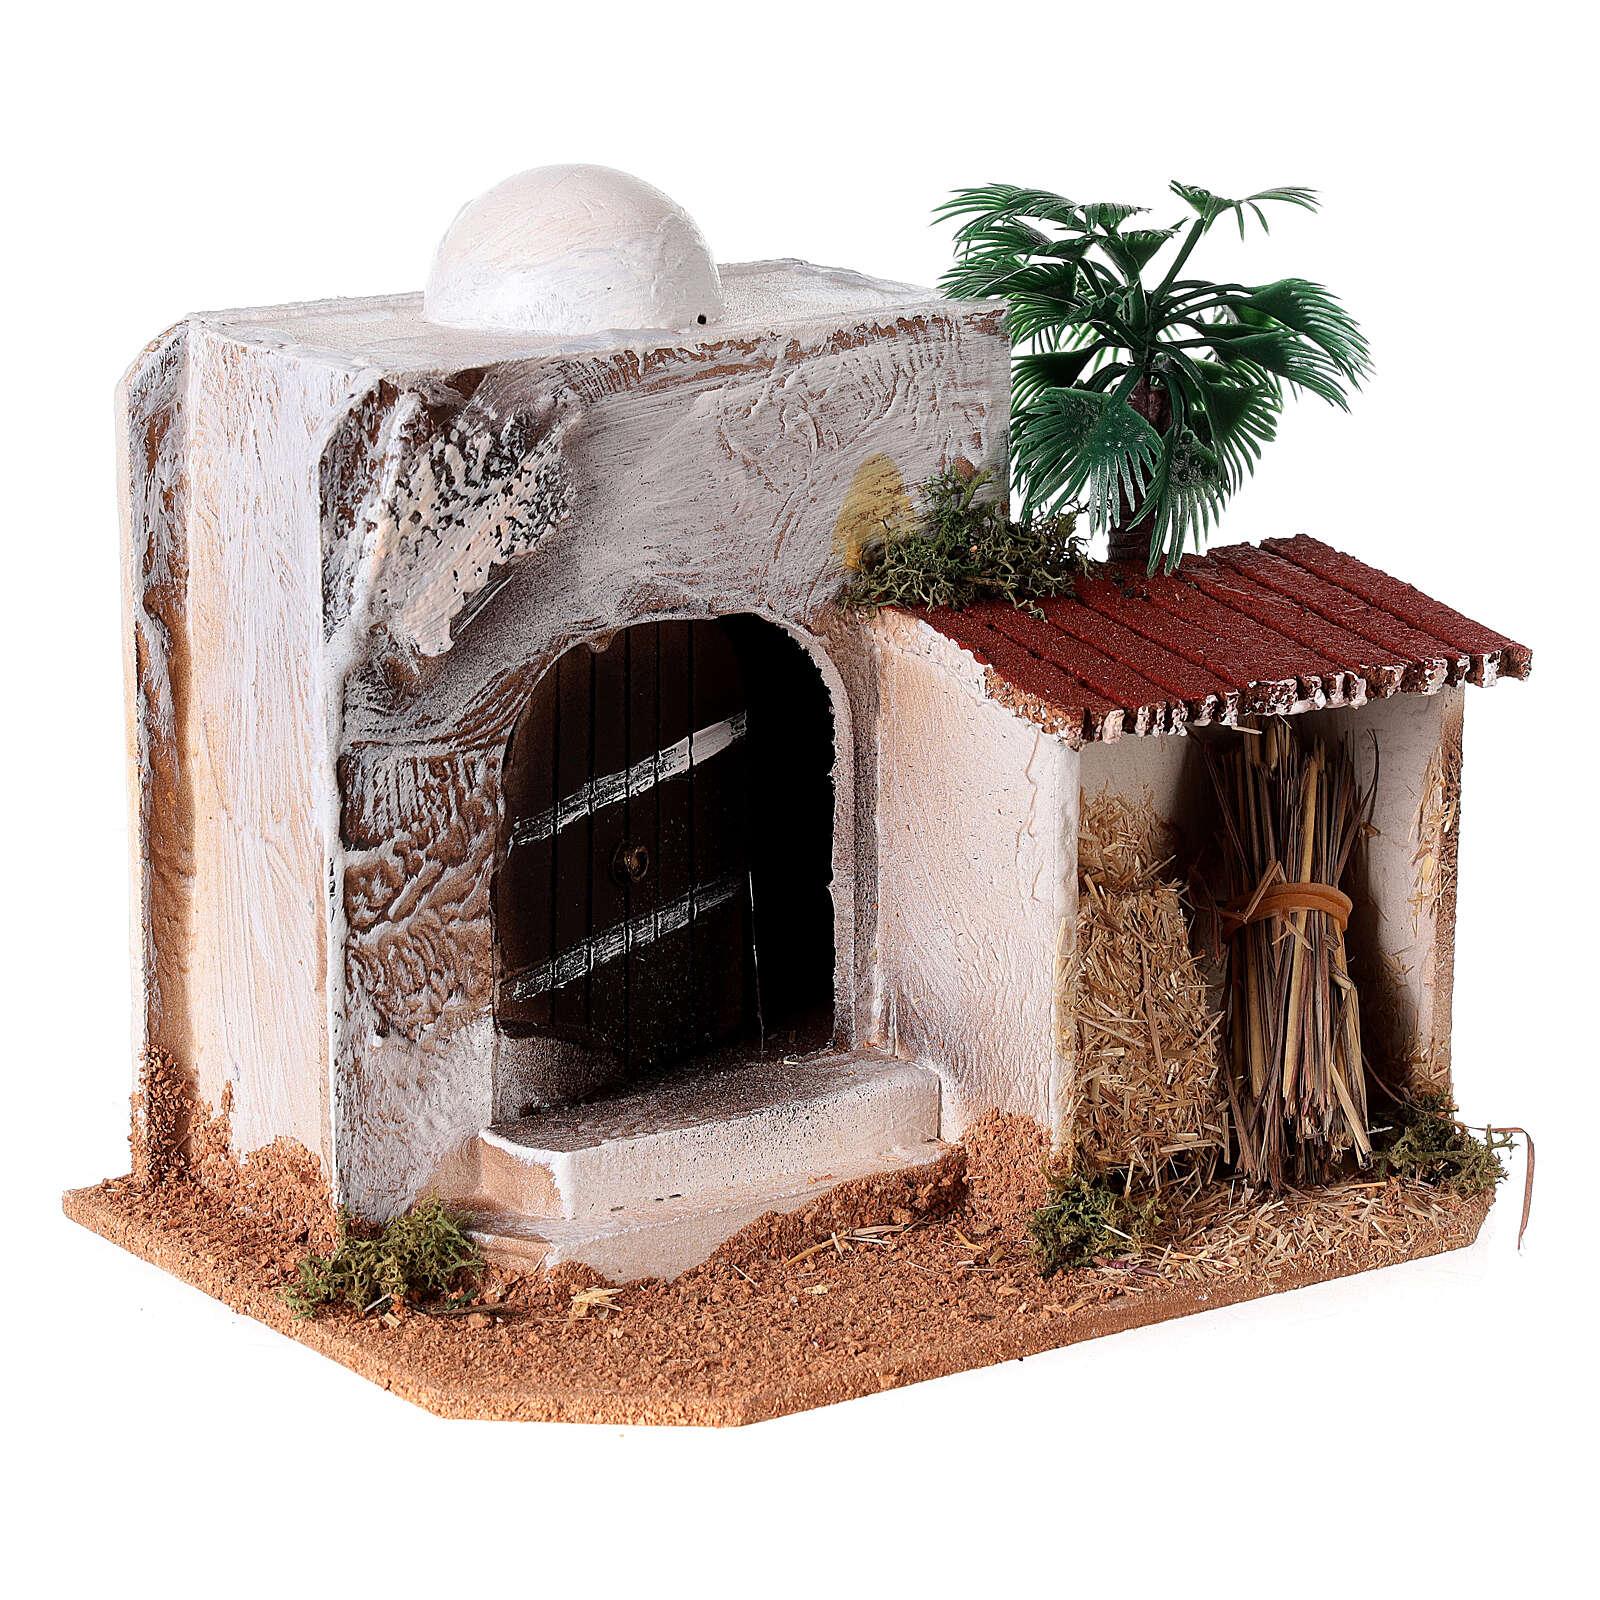 Casa con capanno presepe stile arabo 15x20x15 4